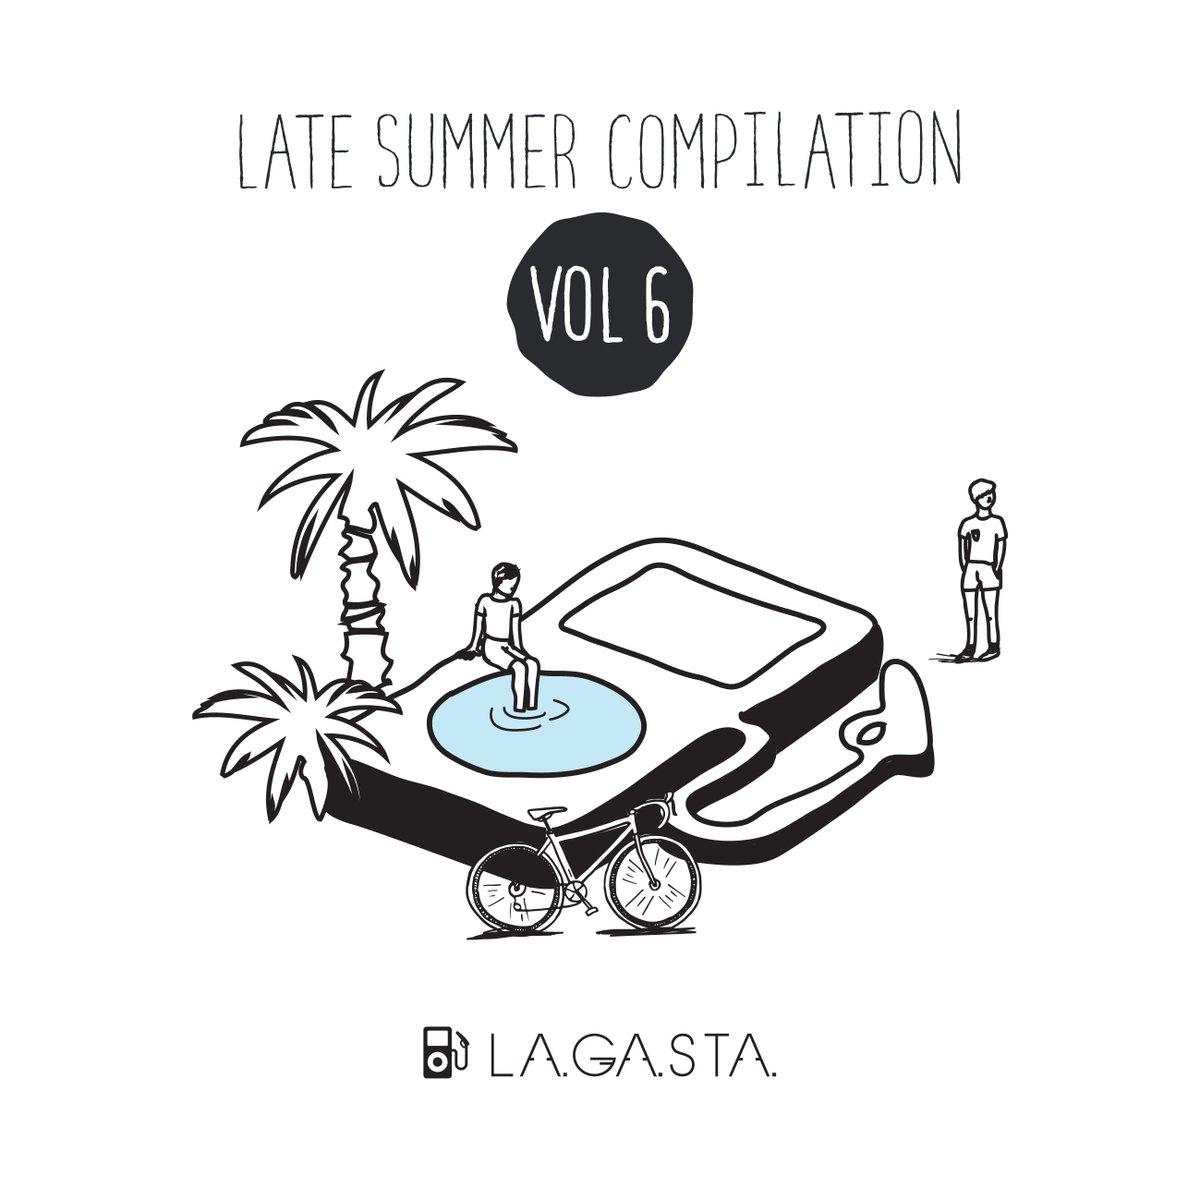 Download La.Ga.Sta.'s Late Summer Compilation Vol. 6 for free!  https://t.co/XA4ub6jAf6 https://t.co/kHDljZerKx